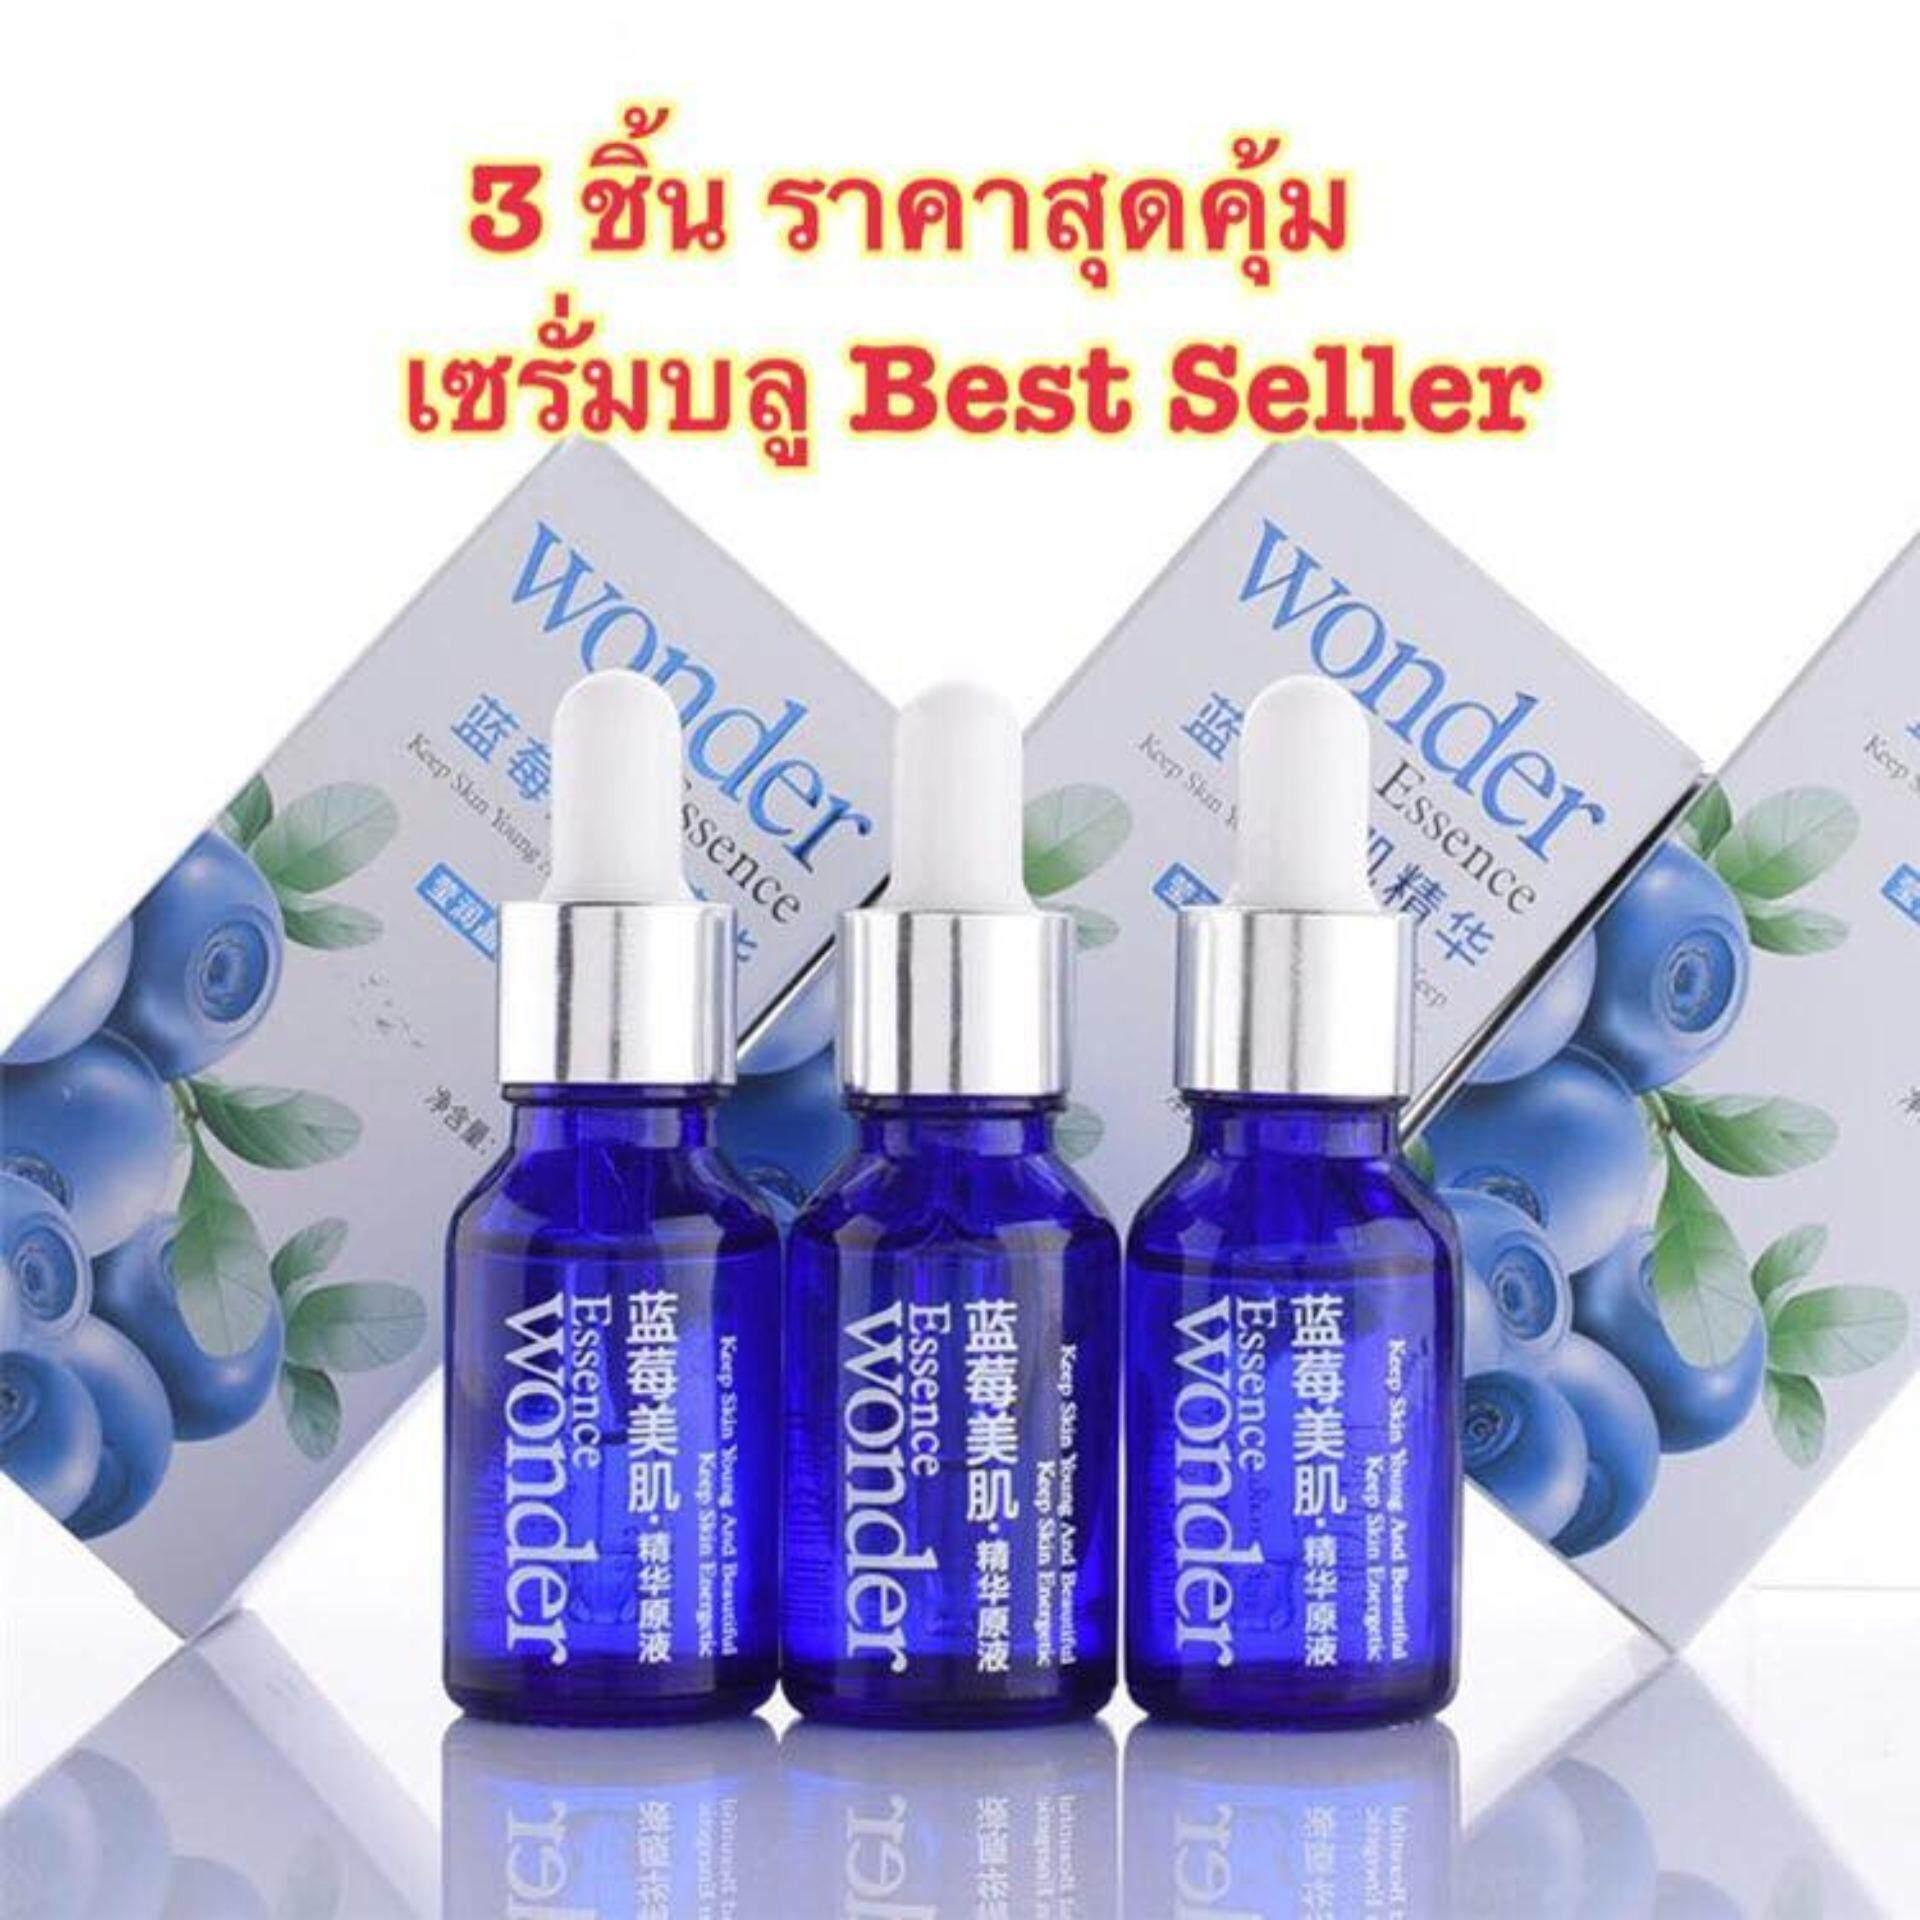 Bioaqua Wonder Blueberry Serum 3 ชิ้น เซรั่มบลูเบอรี่หน้าขาวใส ยอดขายอันดับ1 *สินค้าขายดี* ราคาพิเศษสุดคุ้ม By Nj Together Shop.